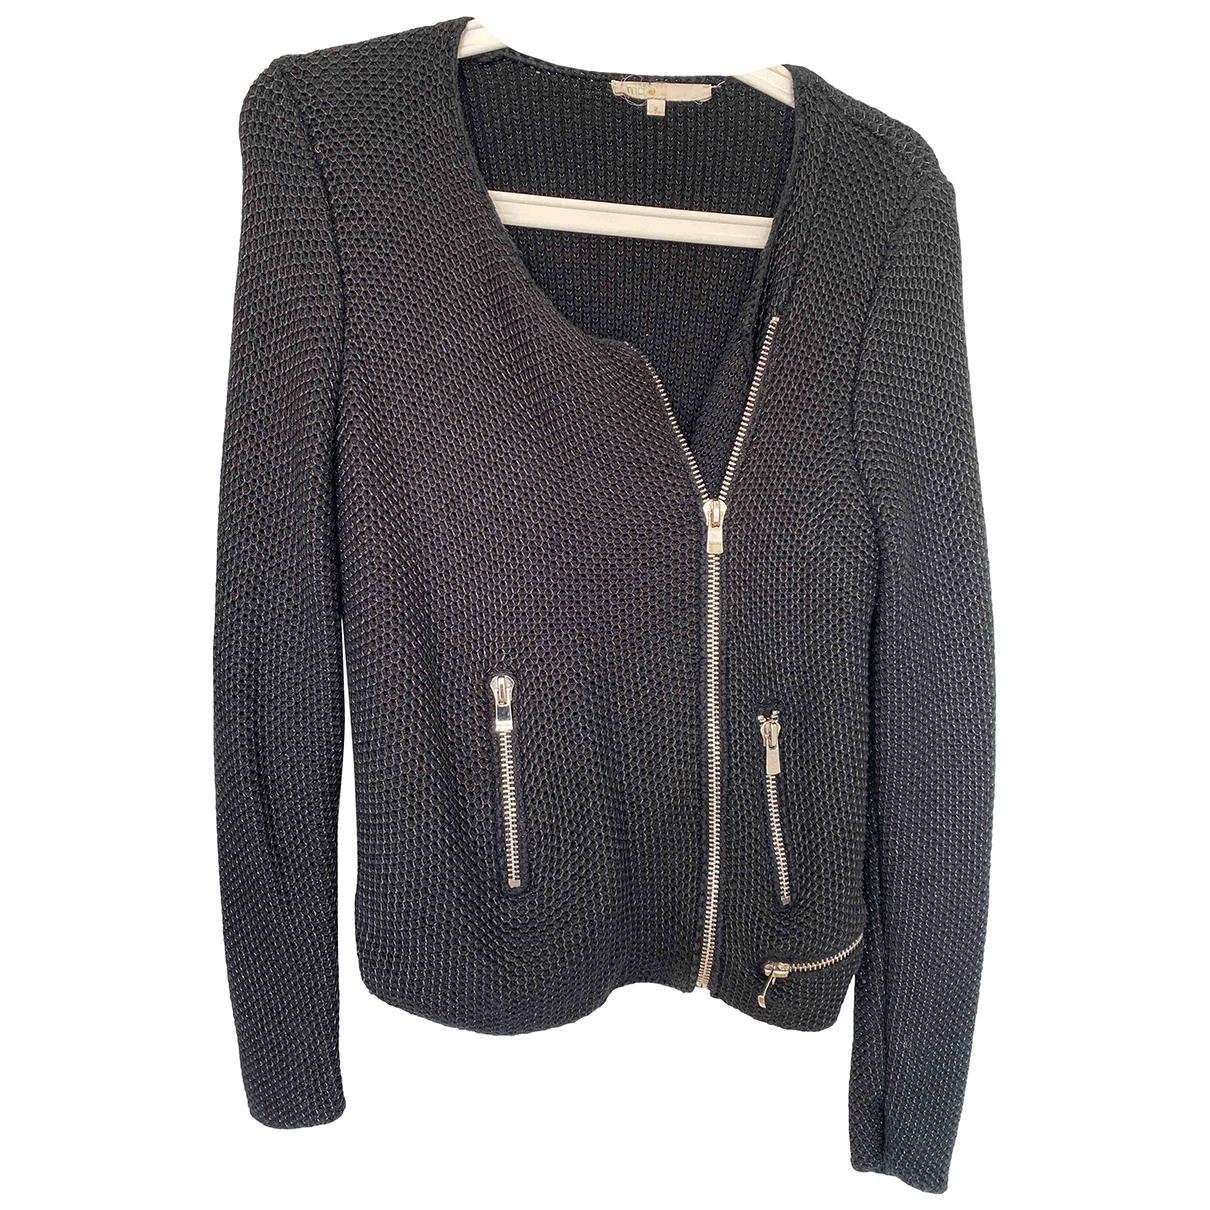 Maje \N Black Cotton jacket for Women 2 0-5